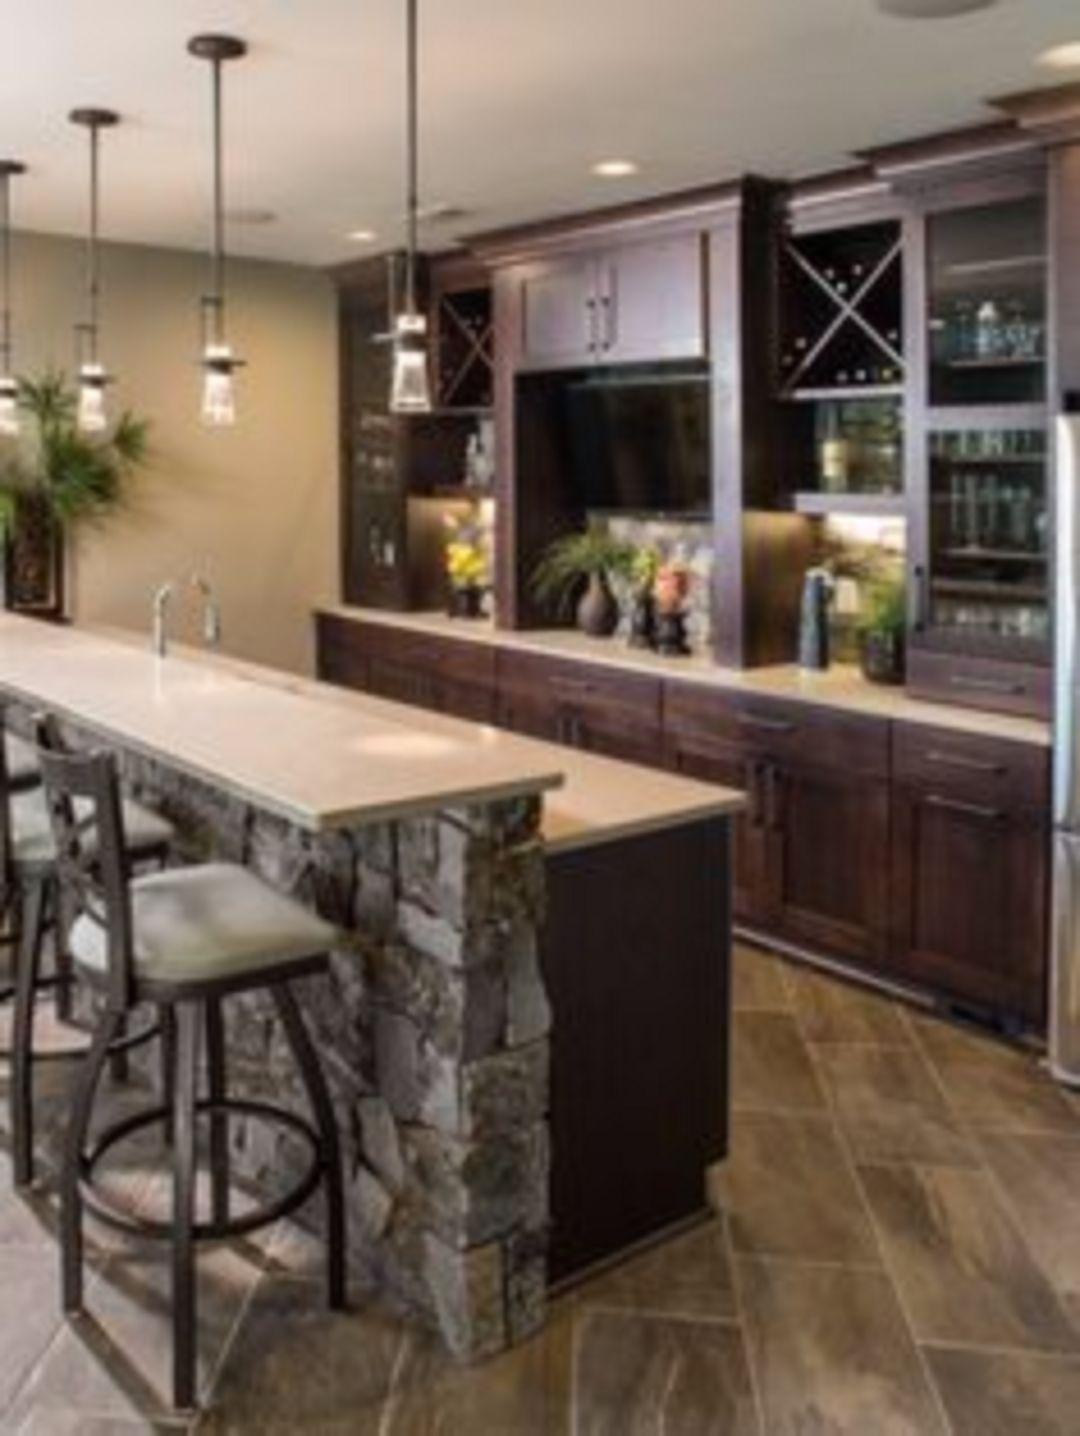 How Do You Like This Bar Kitchen Design Coastal Virginia Magazine S Best Kitchen Bathroom Remodeler Dogo In 2020 Home Bar Rooms Home Bar Designs Kitchen Bar Design